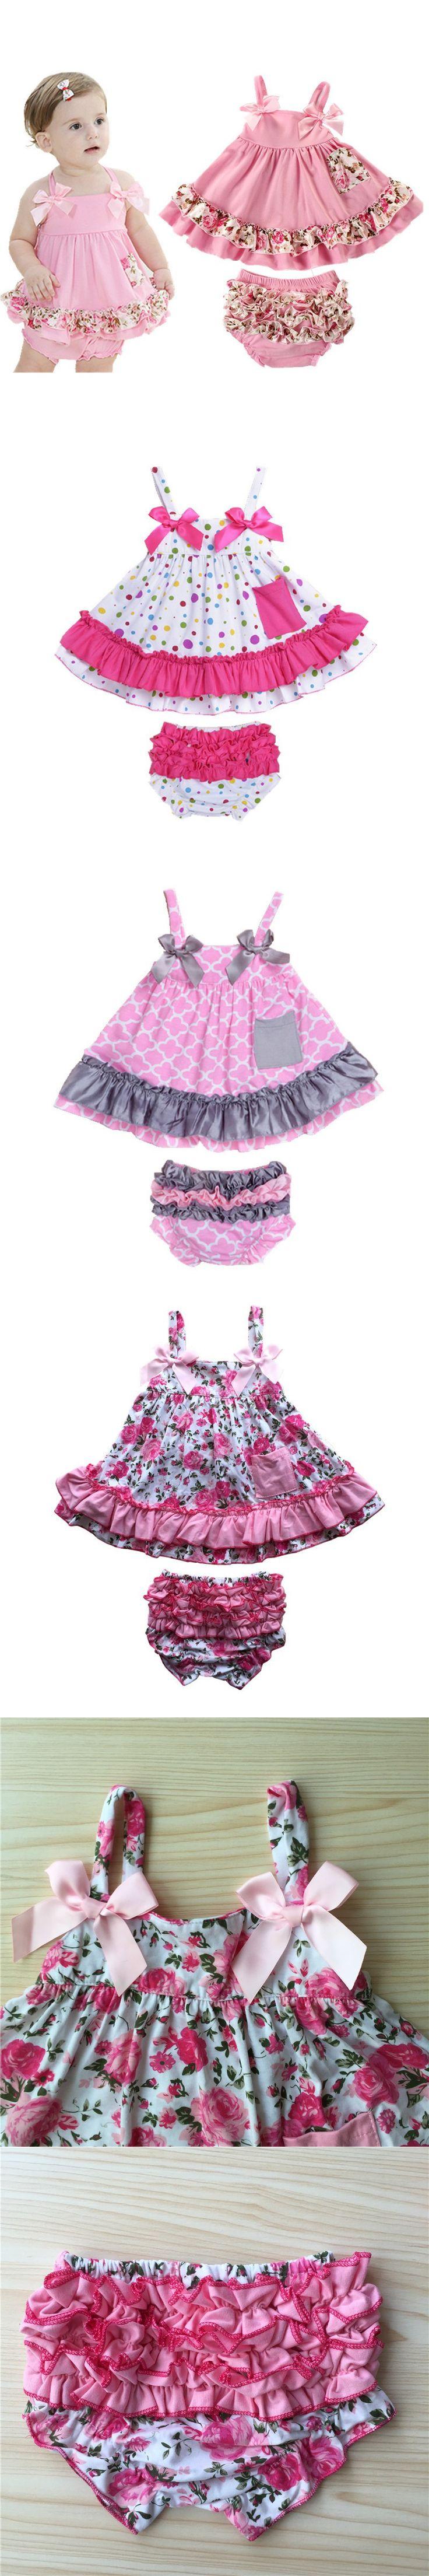 2016 Retail Baby Girl Dress Newborn Baby Girl Clothes Body Bodysuits Sling Bat Roupas Body Bebes Next Baby Clothing Set D-01